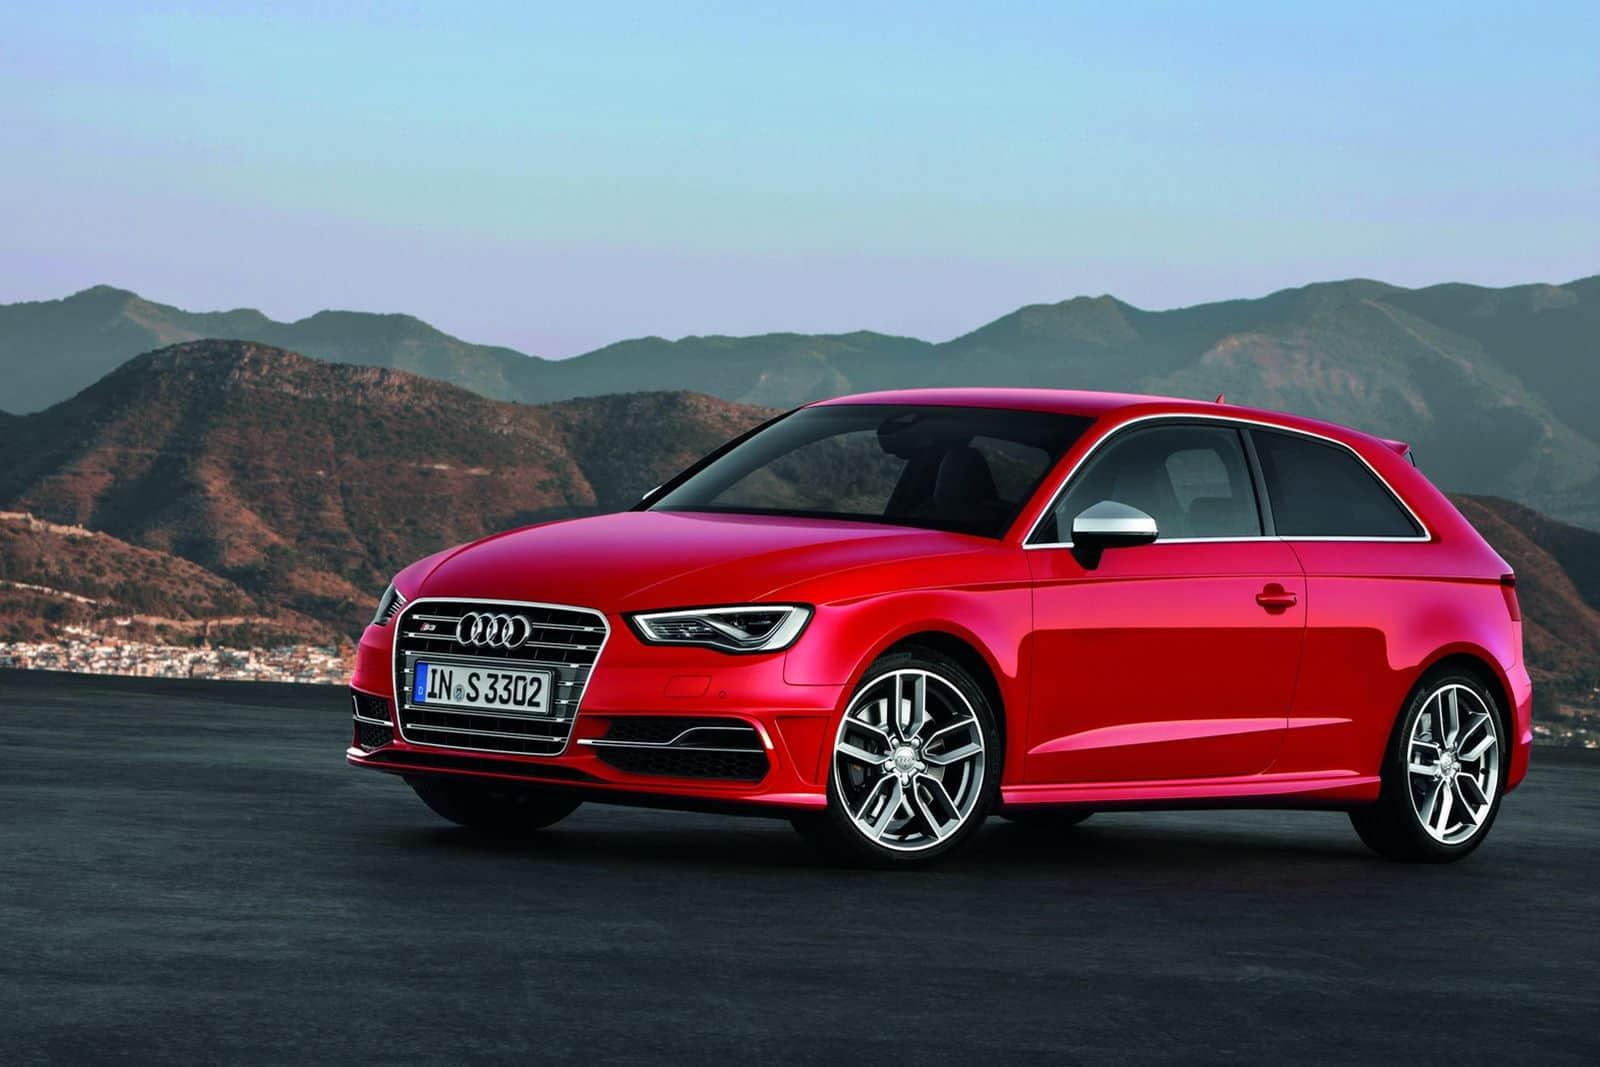 2013 Audi S3 Hatchback price